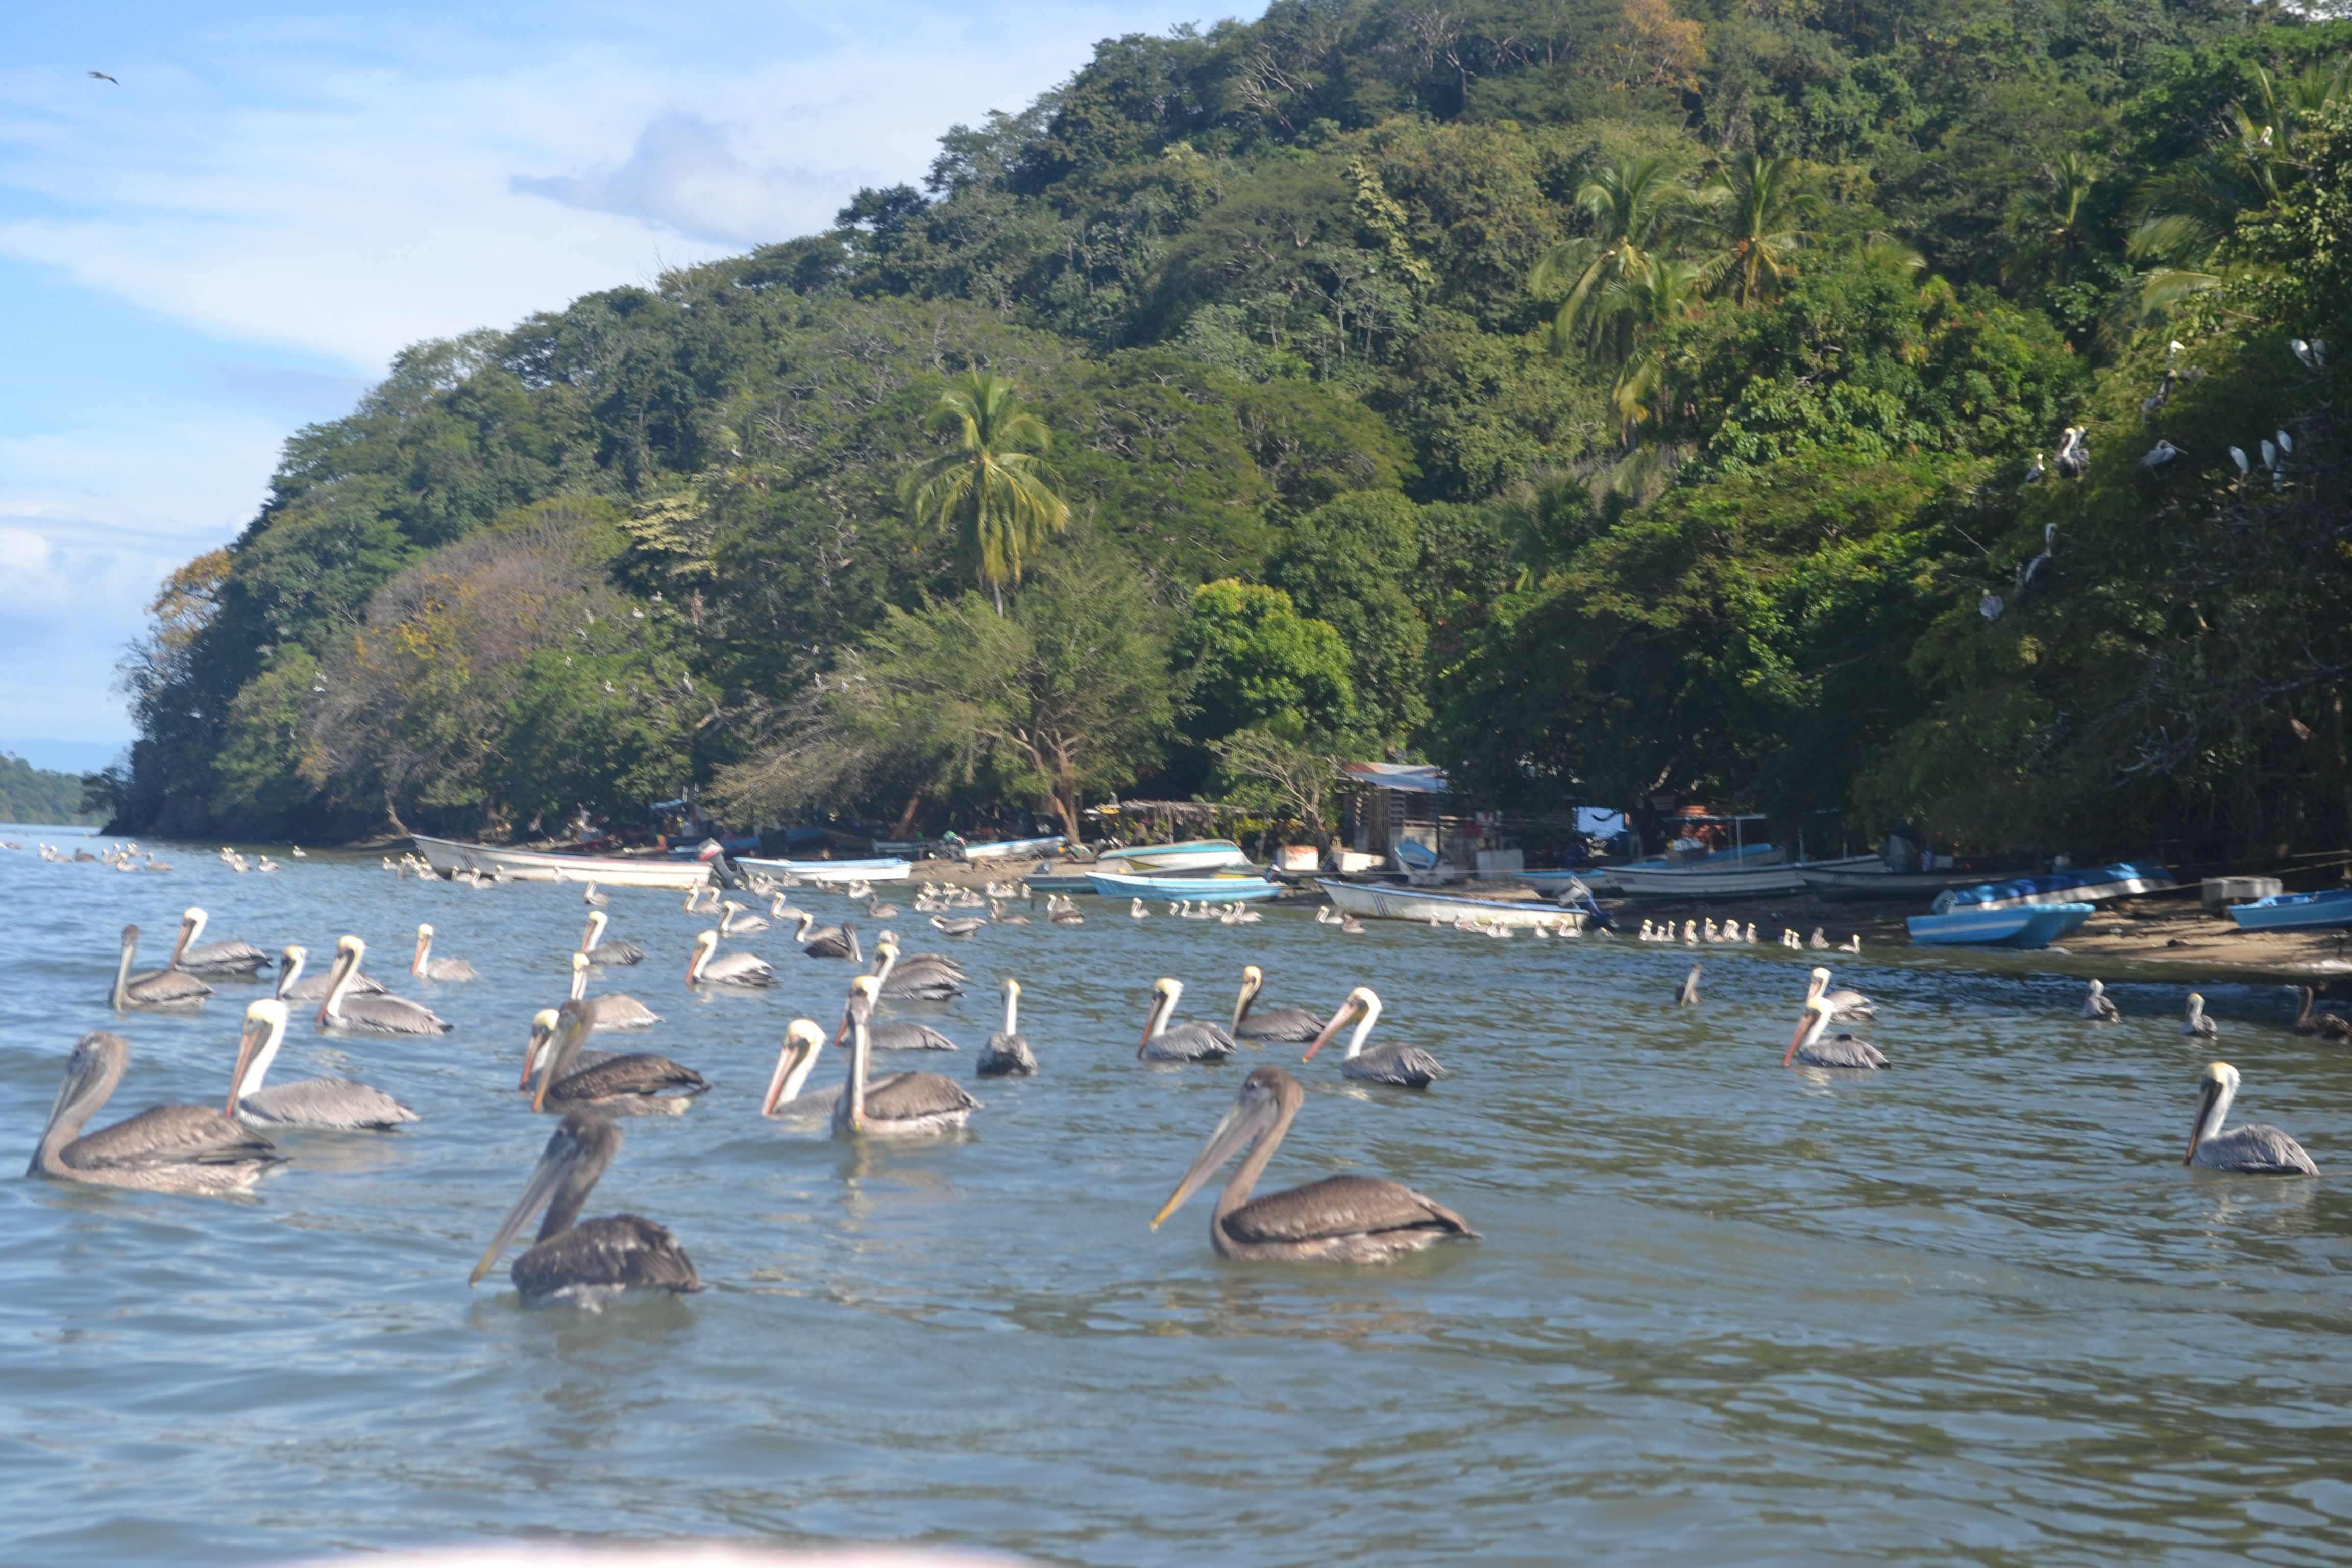 Isla venado puntarenas places i have been for Villas tortuga celestino sinaloa